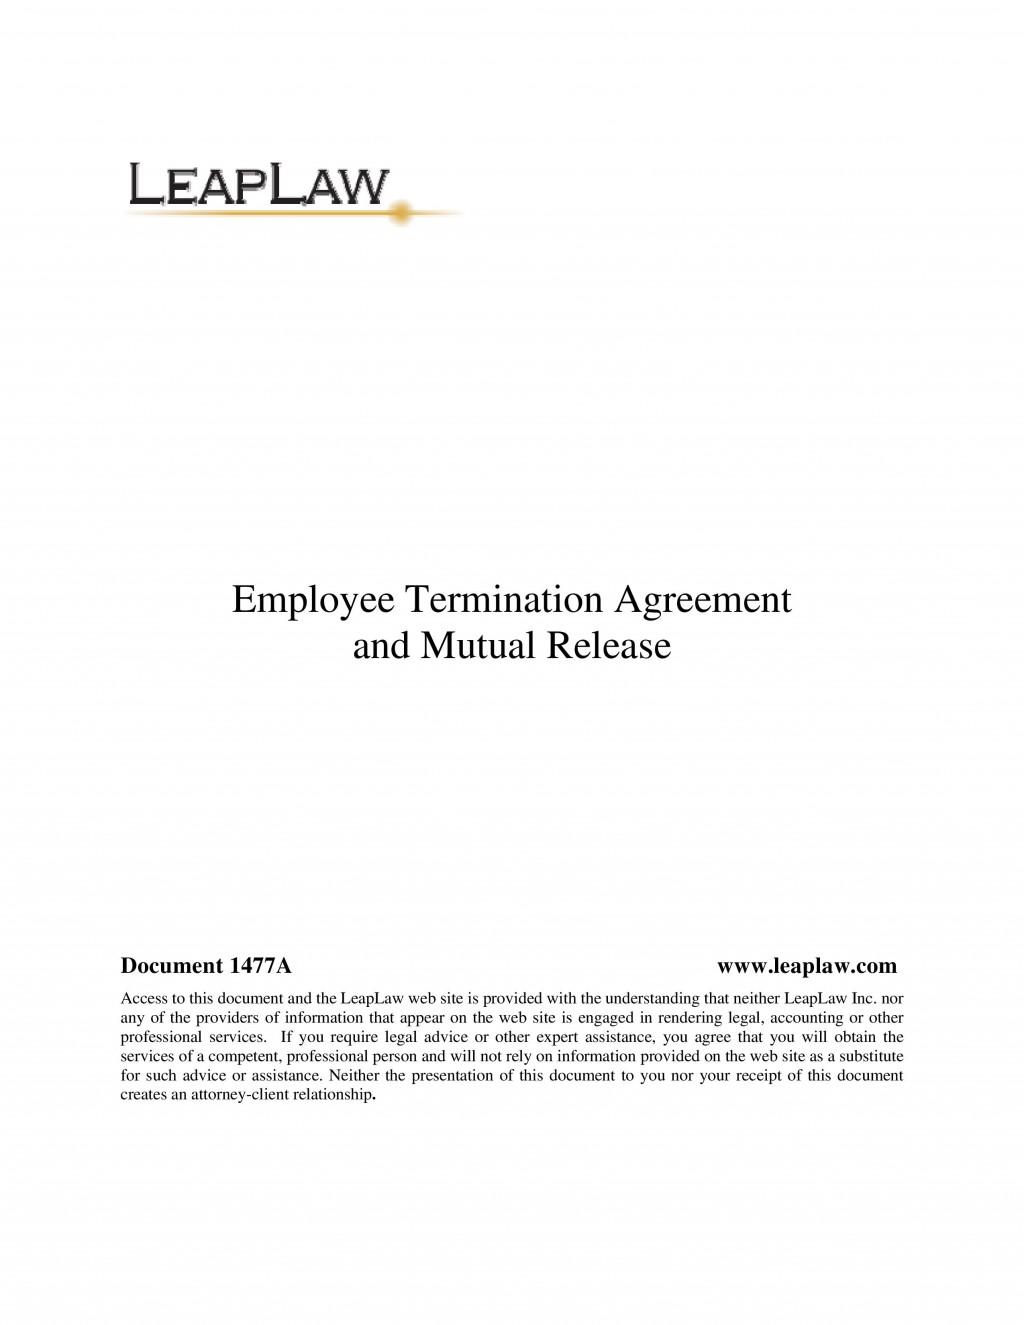 005 Stunning Employment Separation Agreement Template High Def  Nc Shrm Employee FloridaLarge